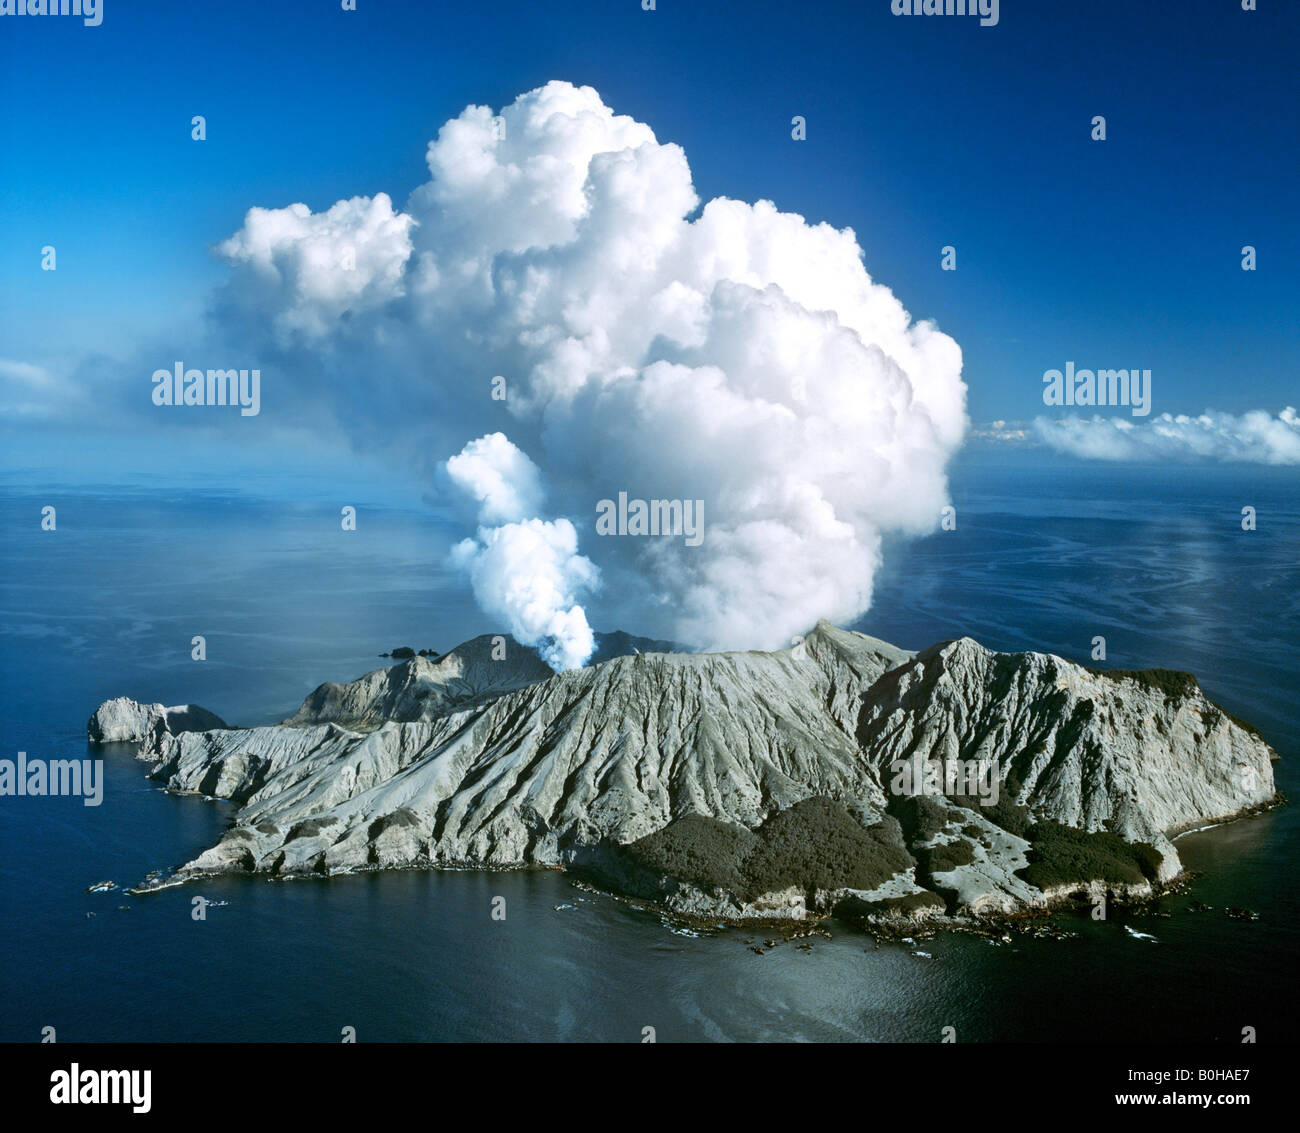 White Island, Vulkanausbruch, Bay of Plenty, Nordinsel, Neuseeland Stockbild